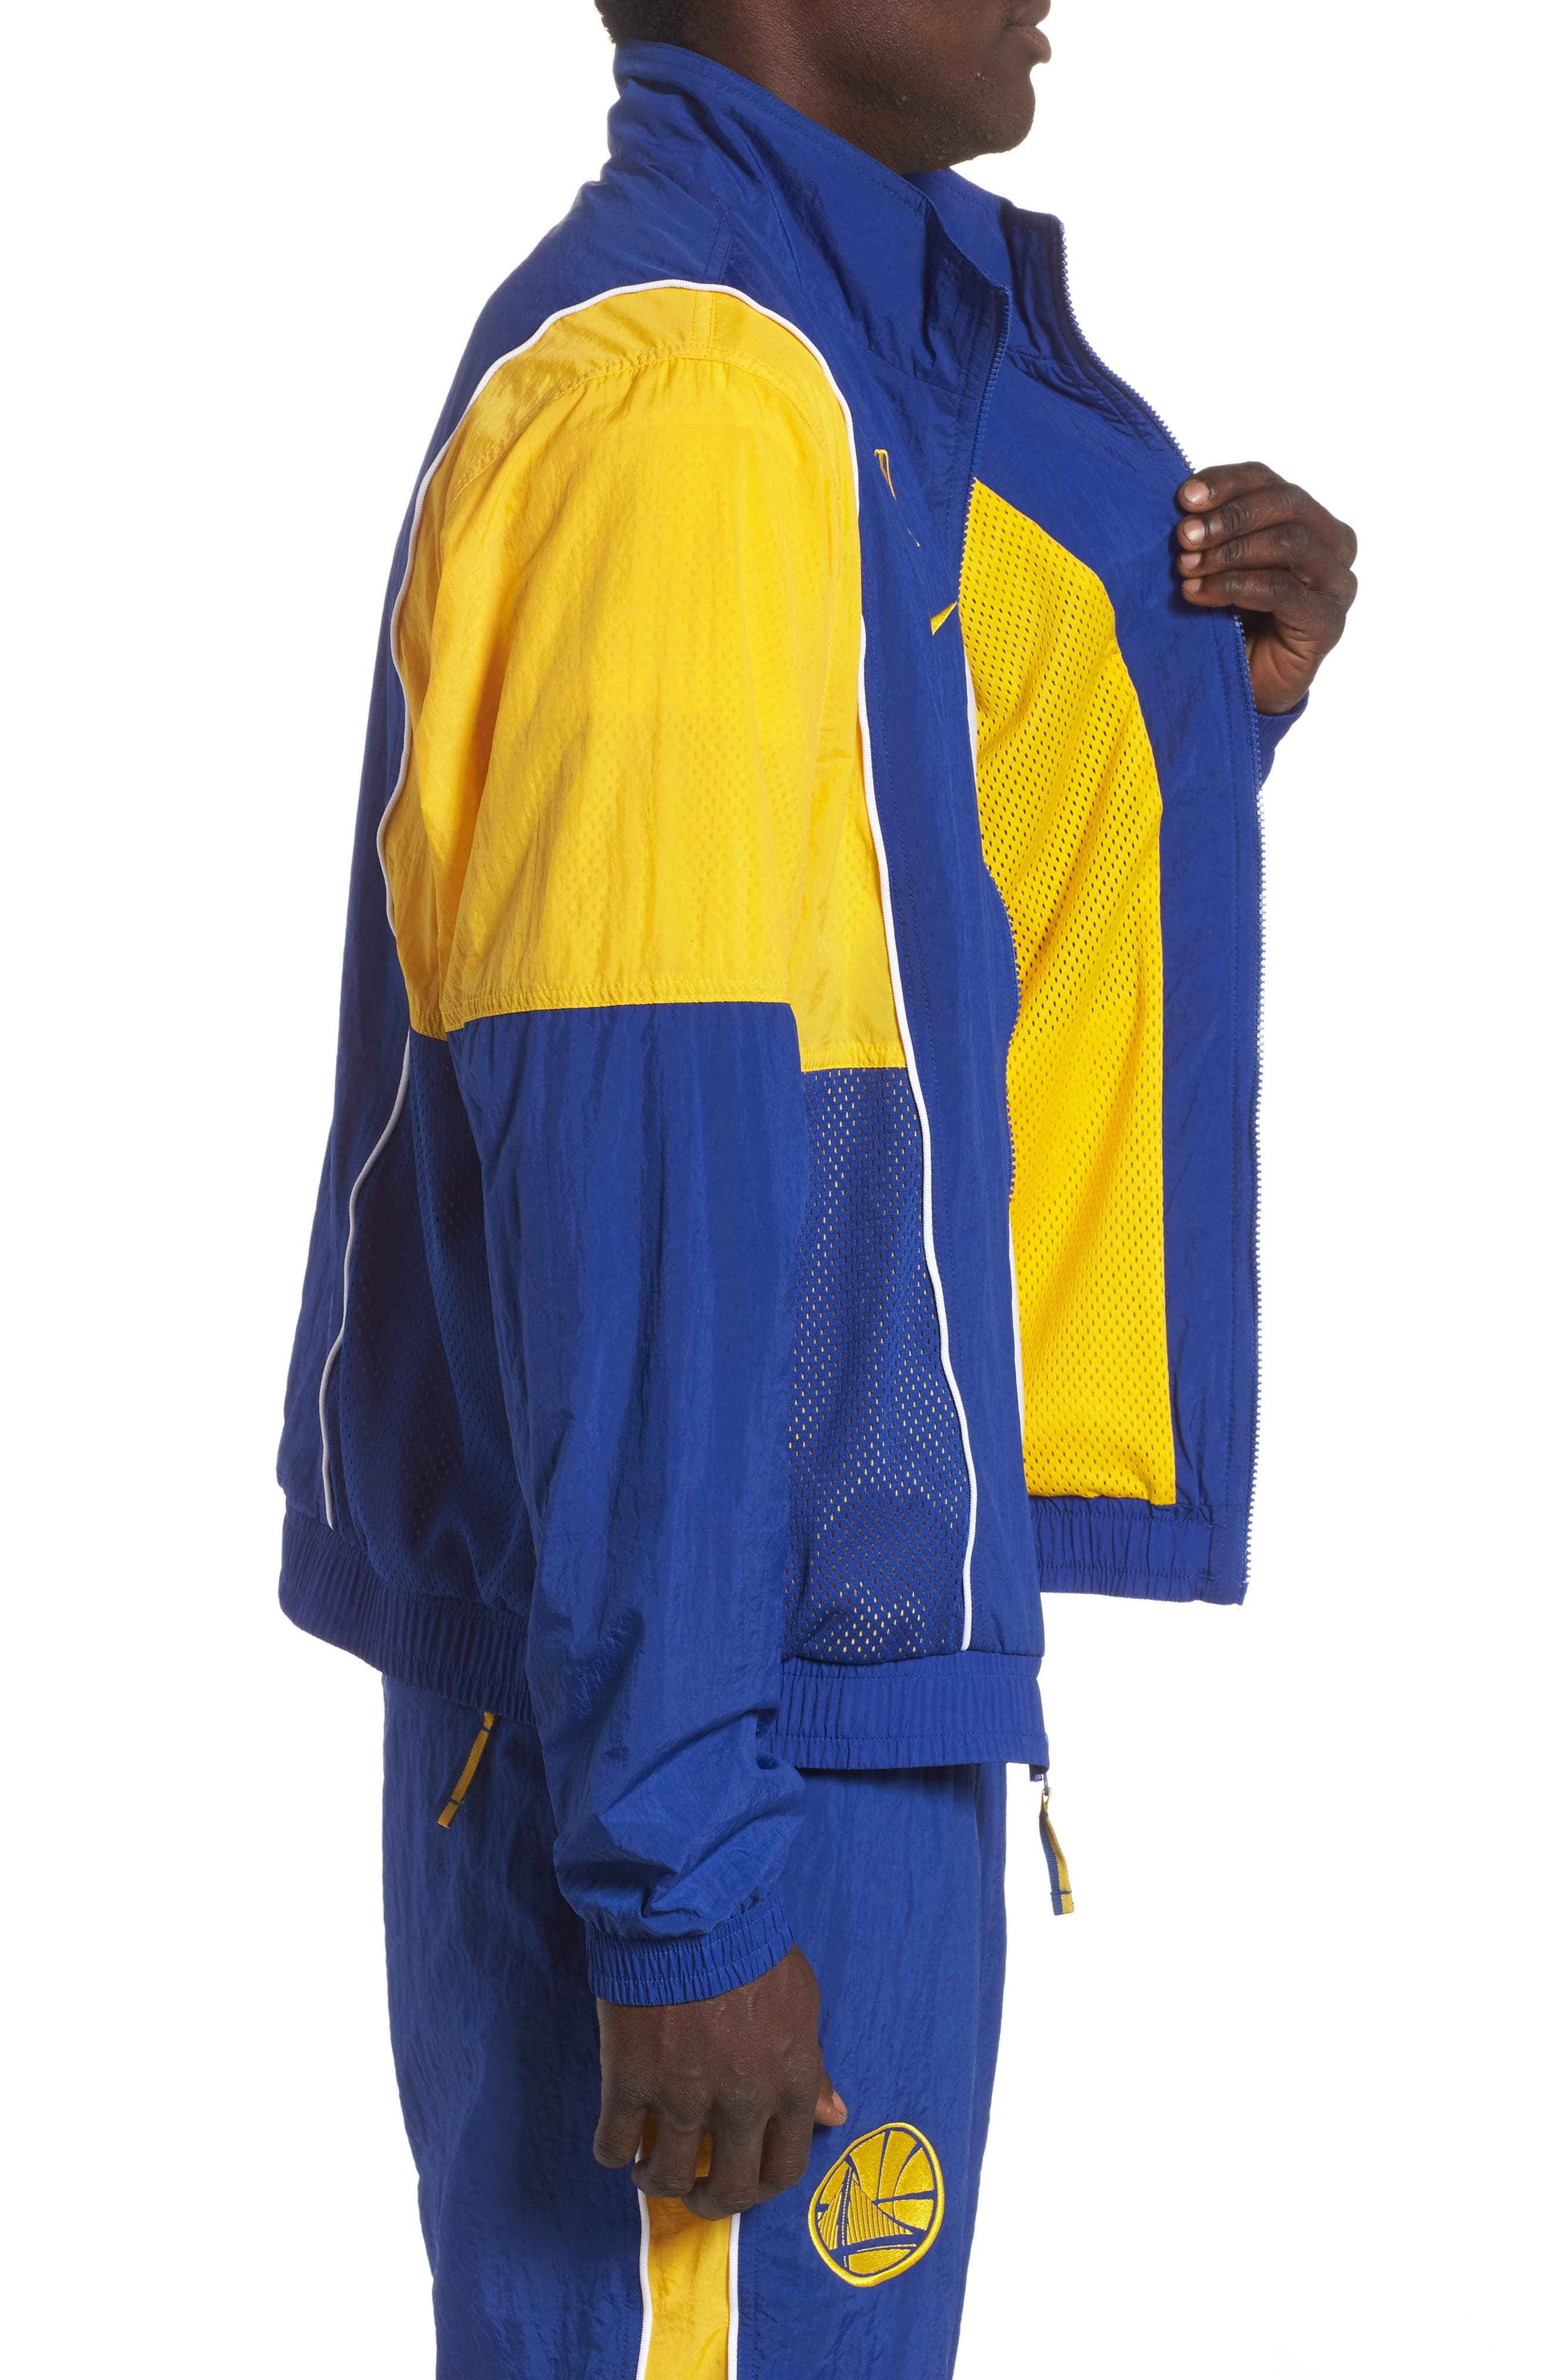 Golden State Warriors Track Jacket,                             Alternate thumbnail 3, color,                             RUSH BLUE/ AMARILLO/ WHITE